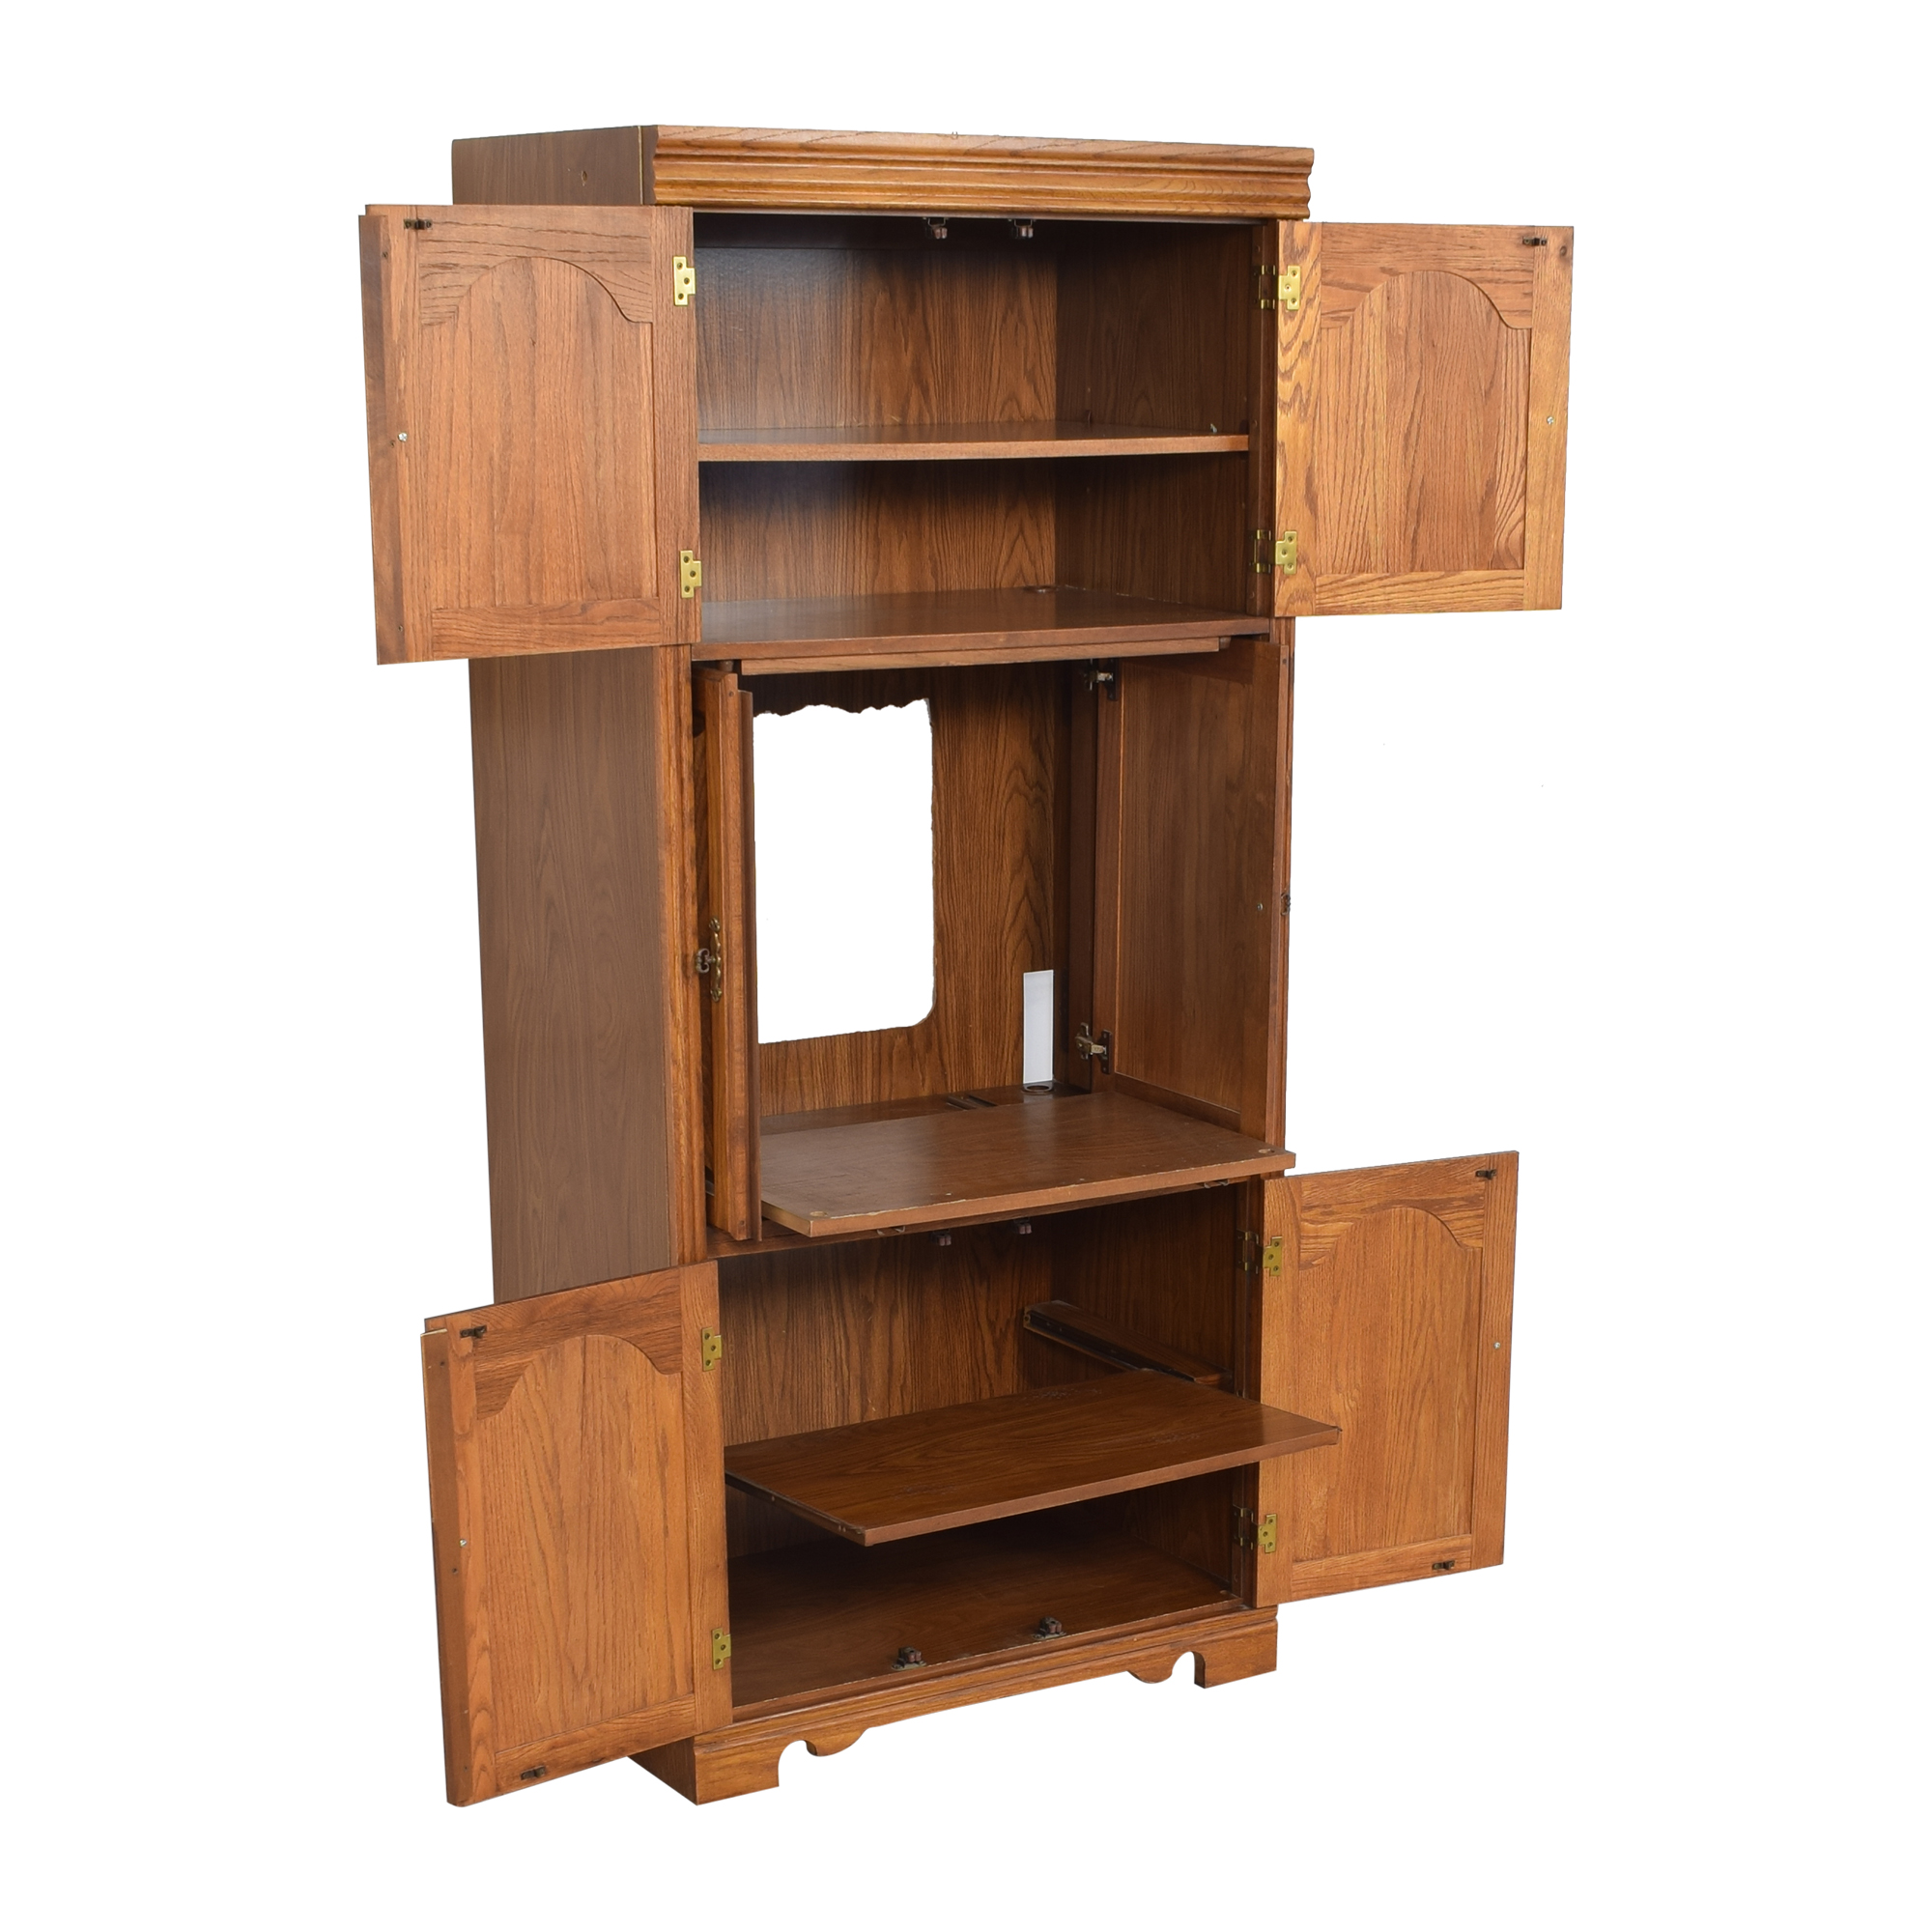 buy Broyhill Illuminated Media Cabinet Broyhill Furniture Storage